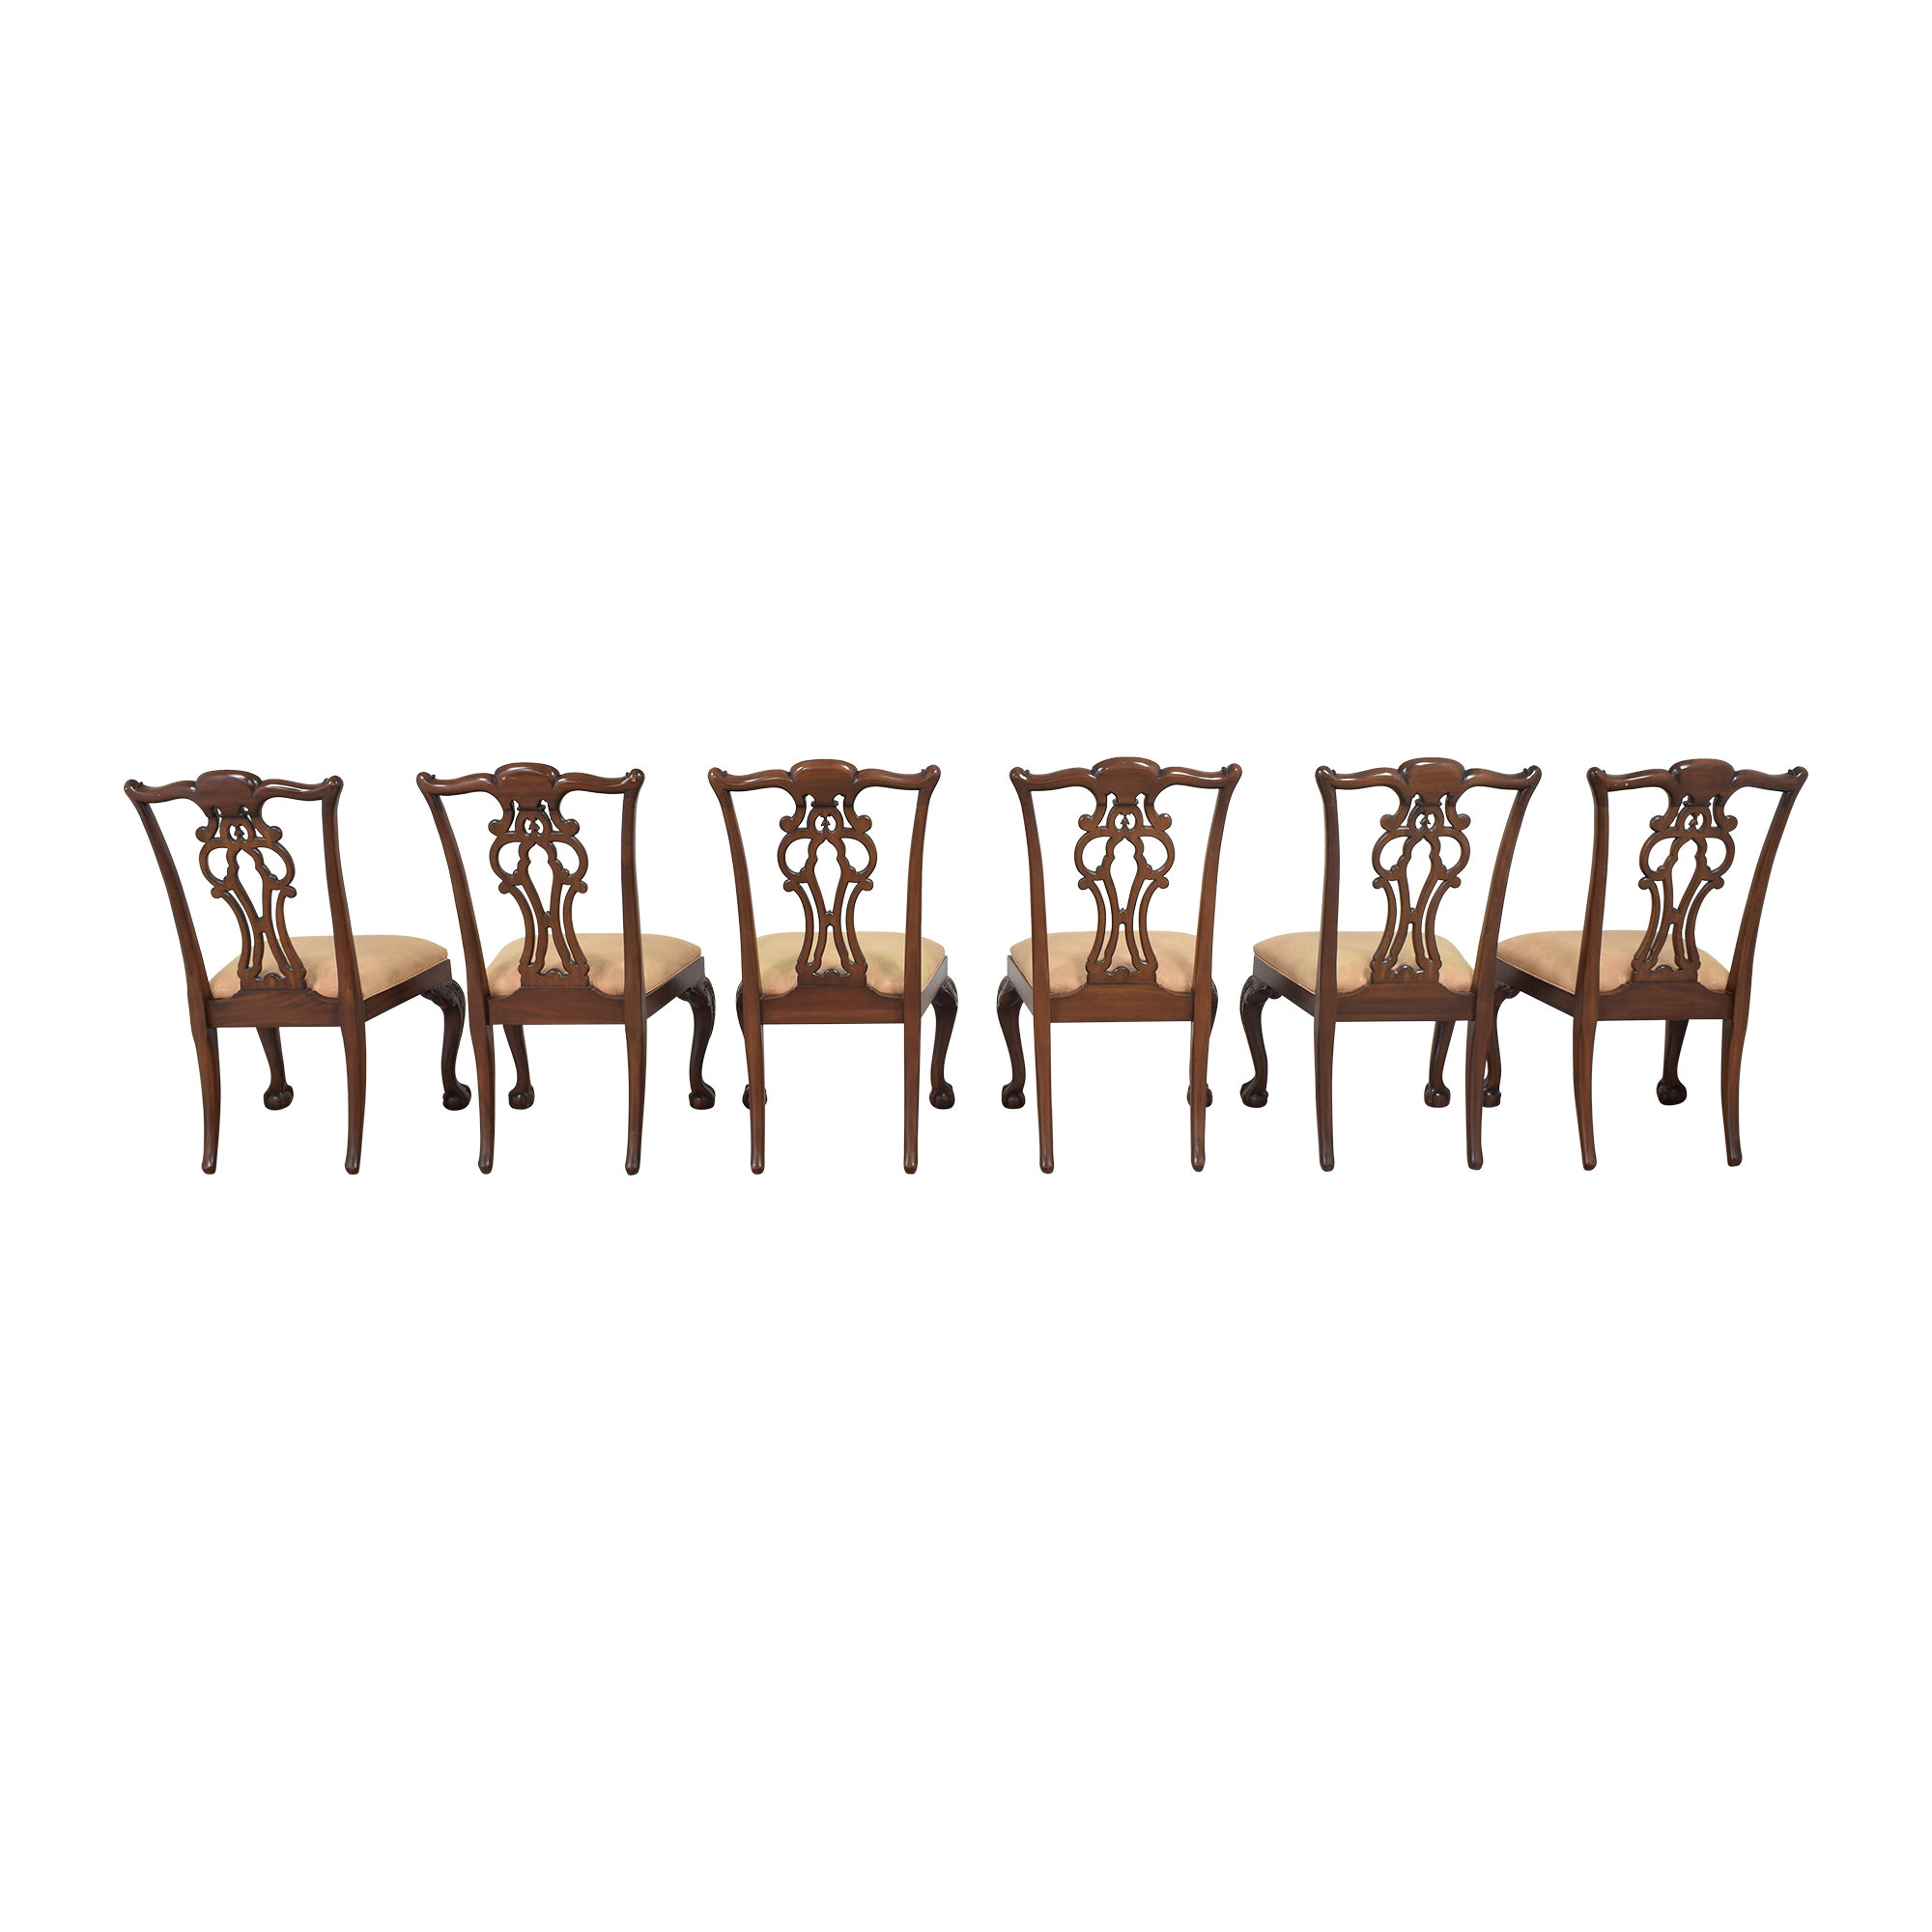 Ethan Allen Ethan Allen Chauncey Dining Side Chairs nj